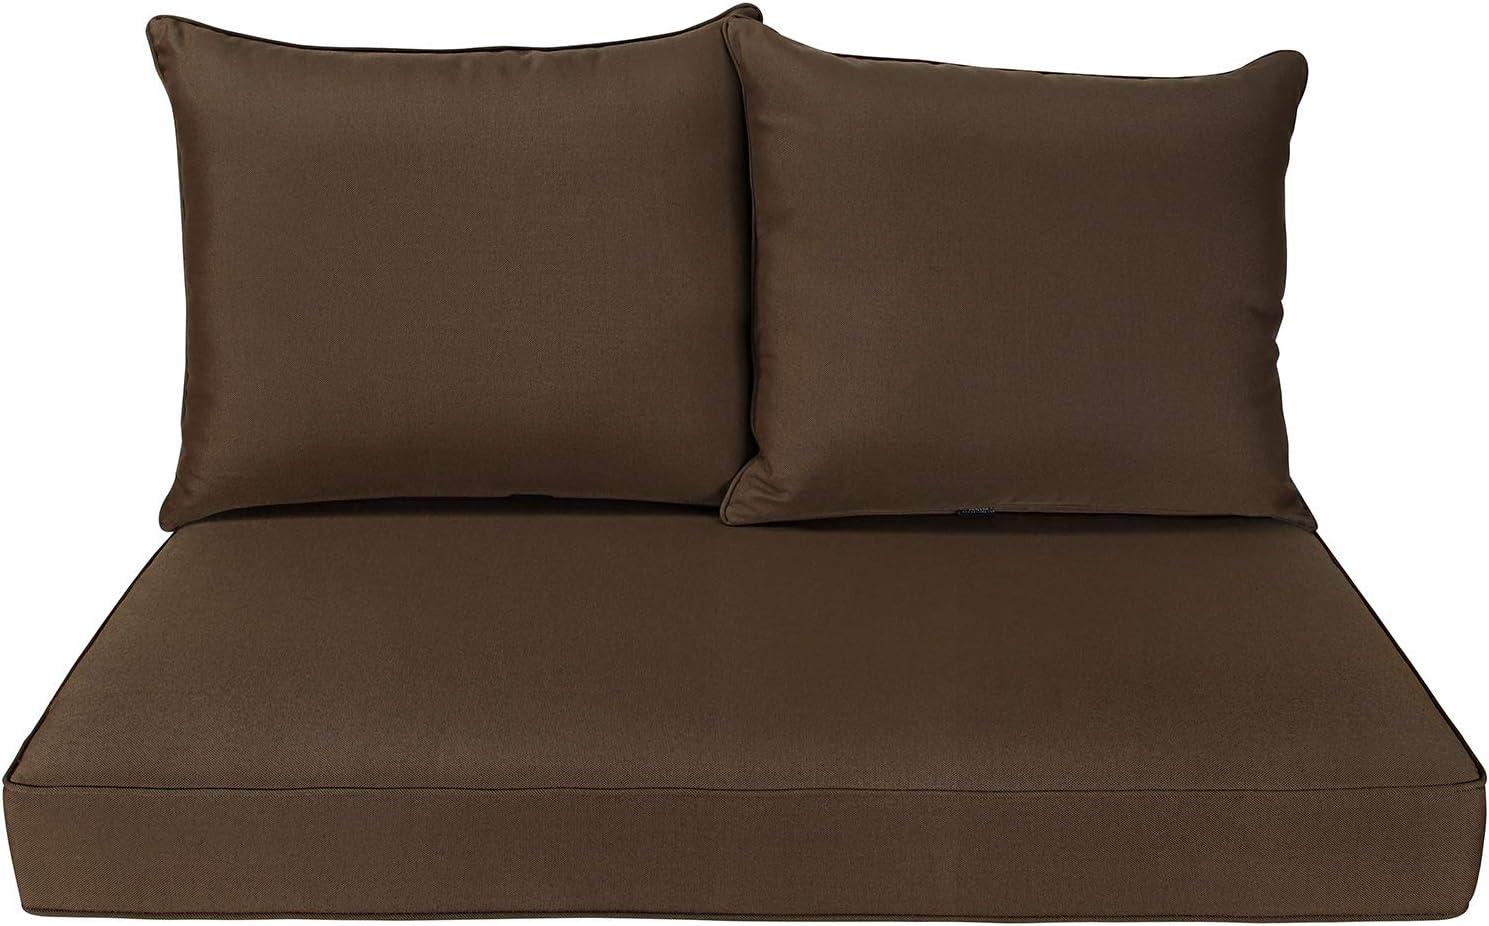 BOSSIMA Patio Furniture Cushions Comofort Deep Seat Loveseat Cushion Indoor Outdoor Seating Cushions Coffee